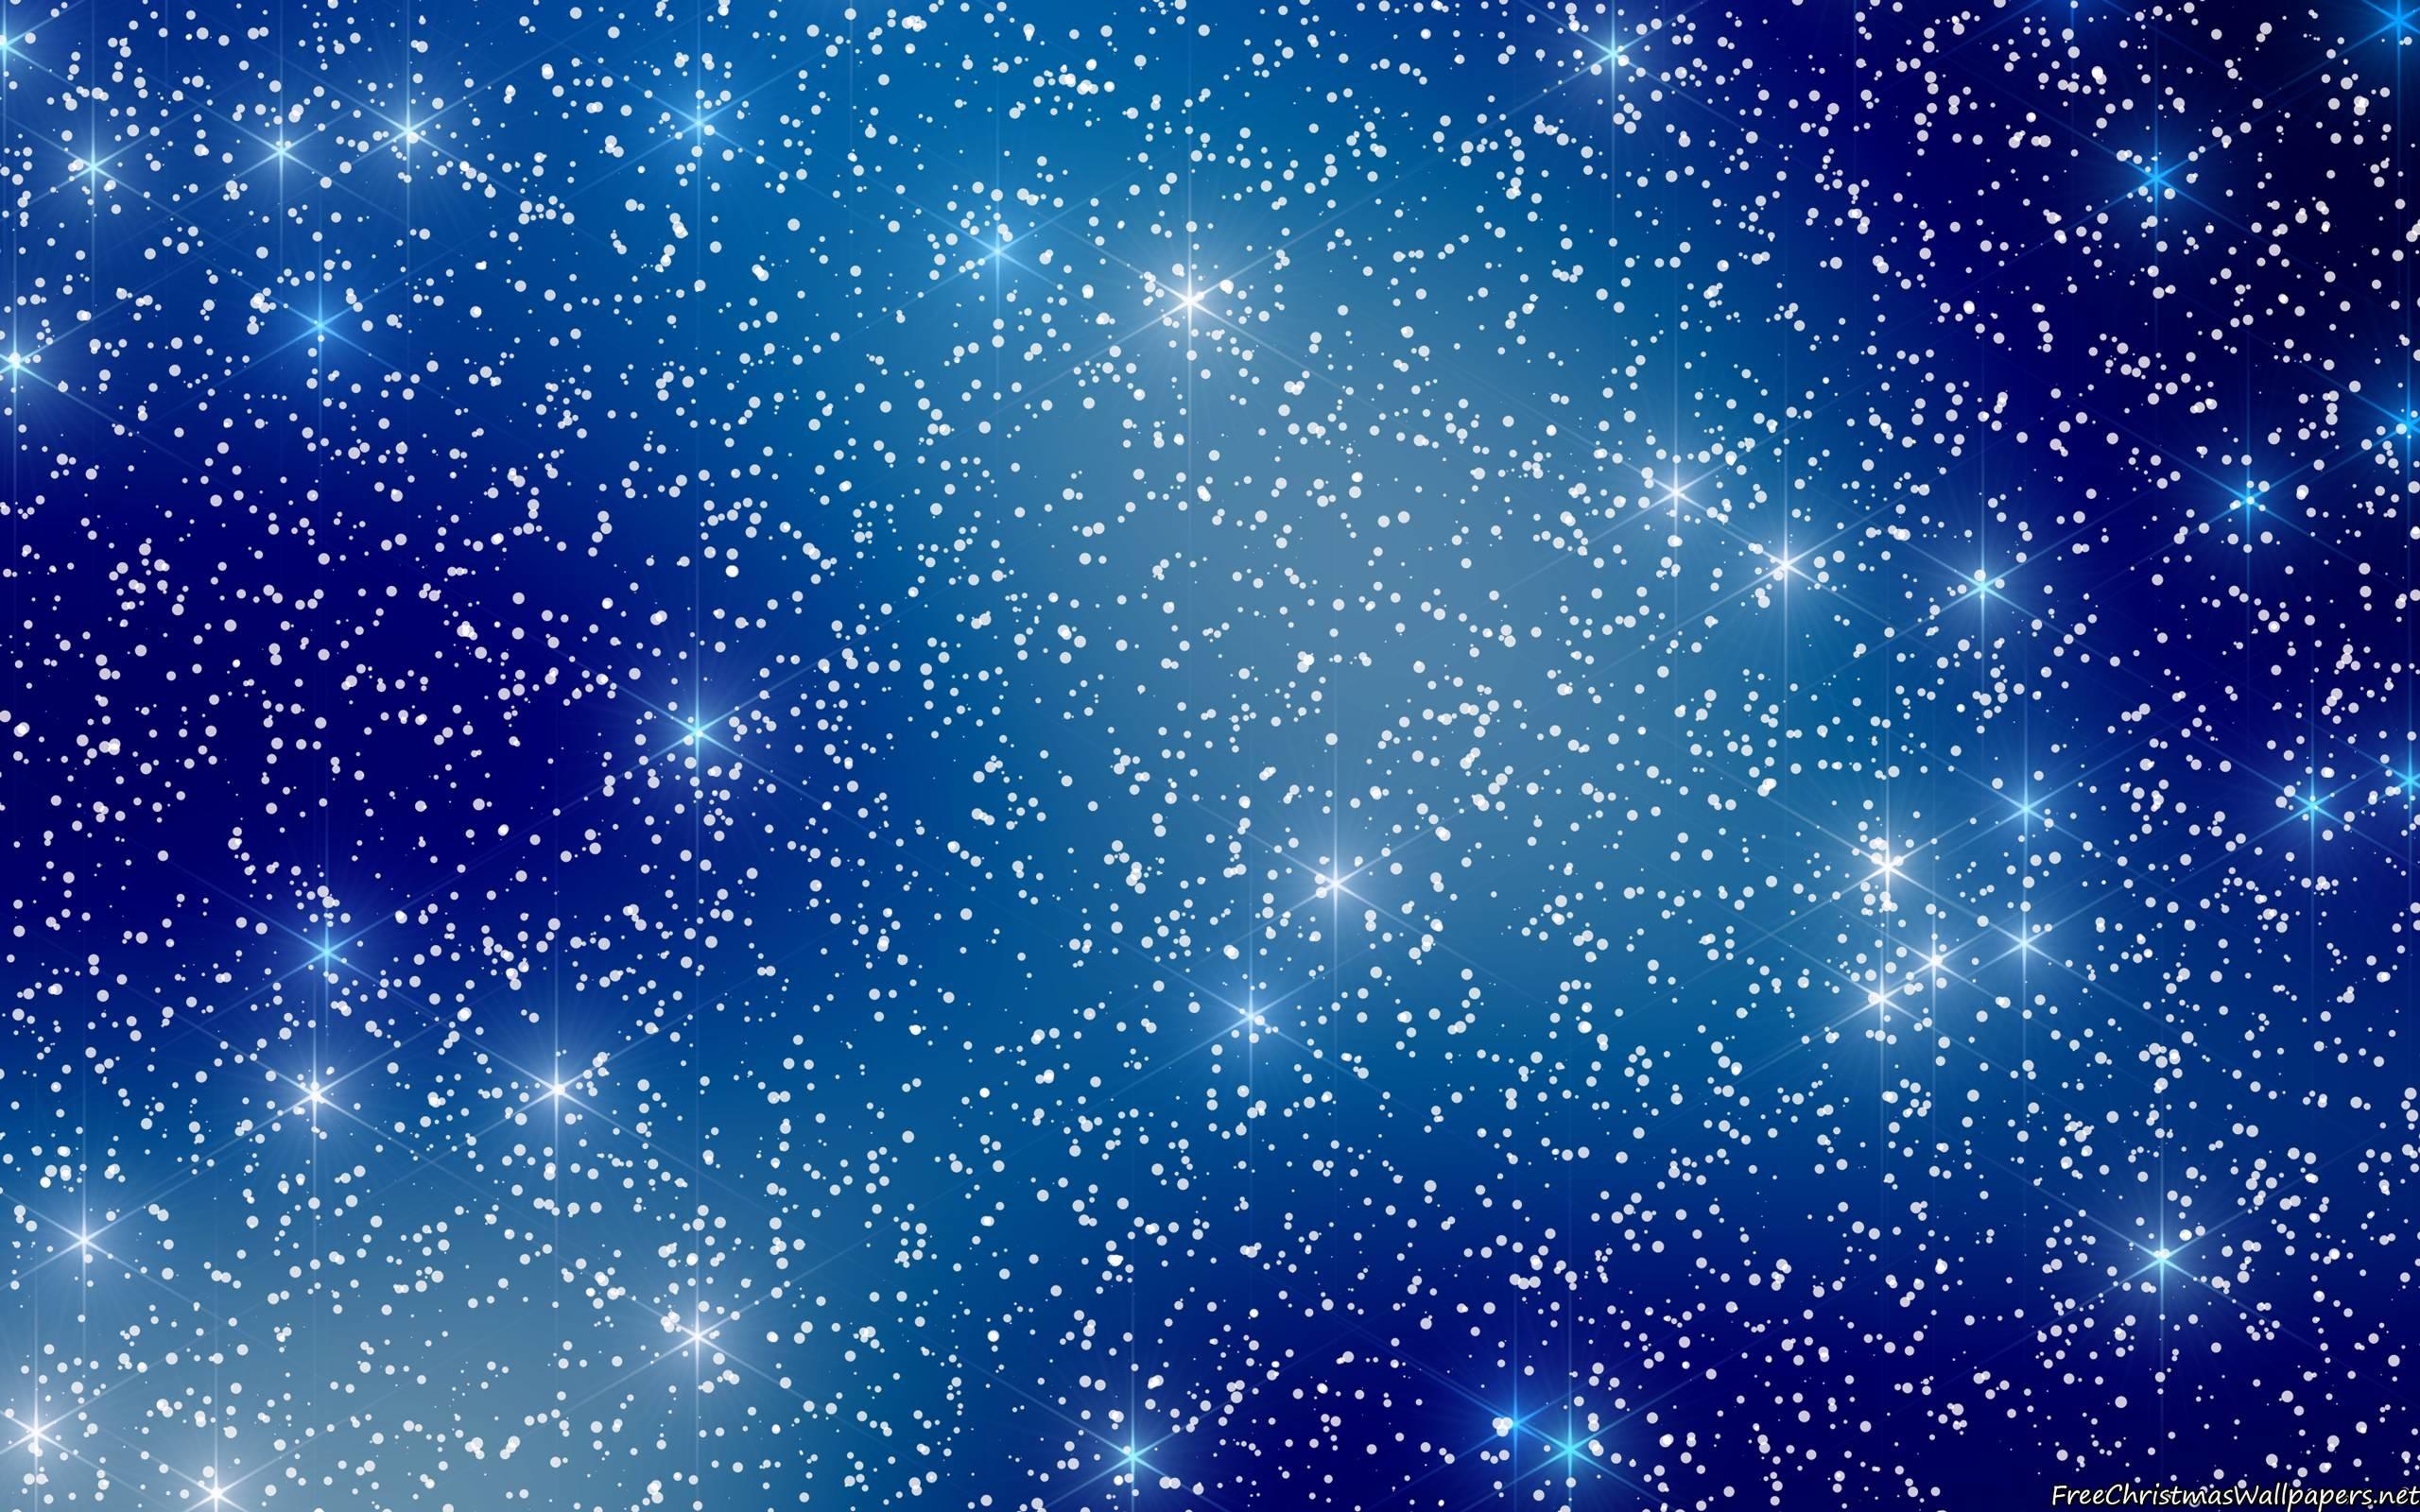 Falling Stars Grunge Wallpaper Sparkling Wallpapers 69 Images